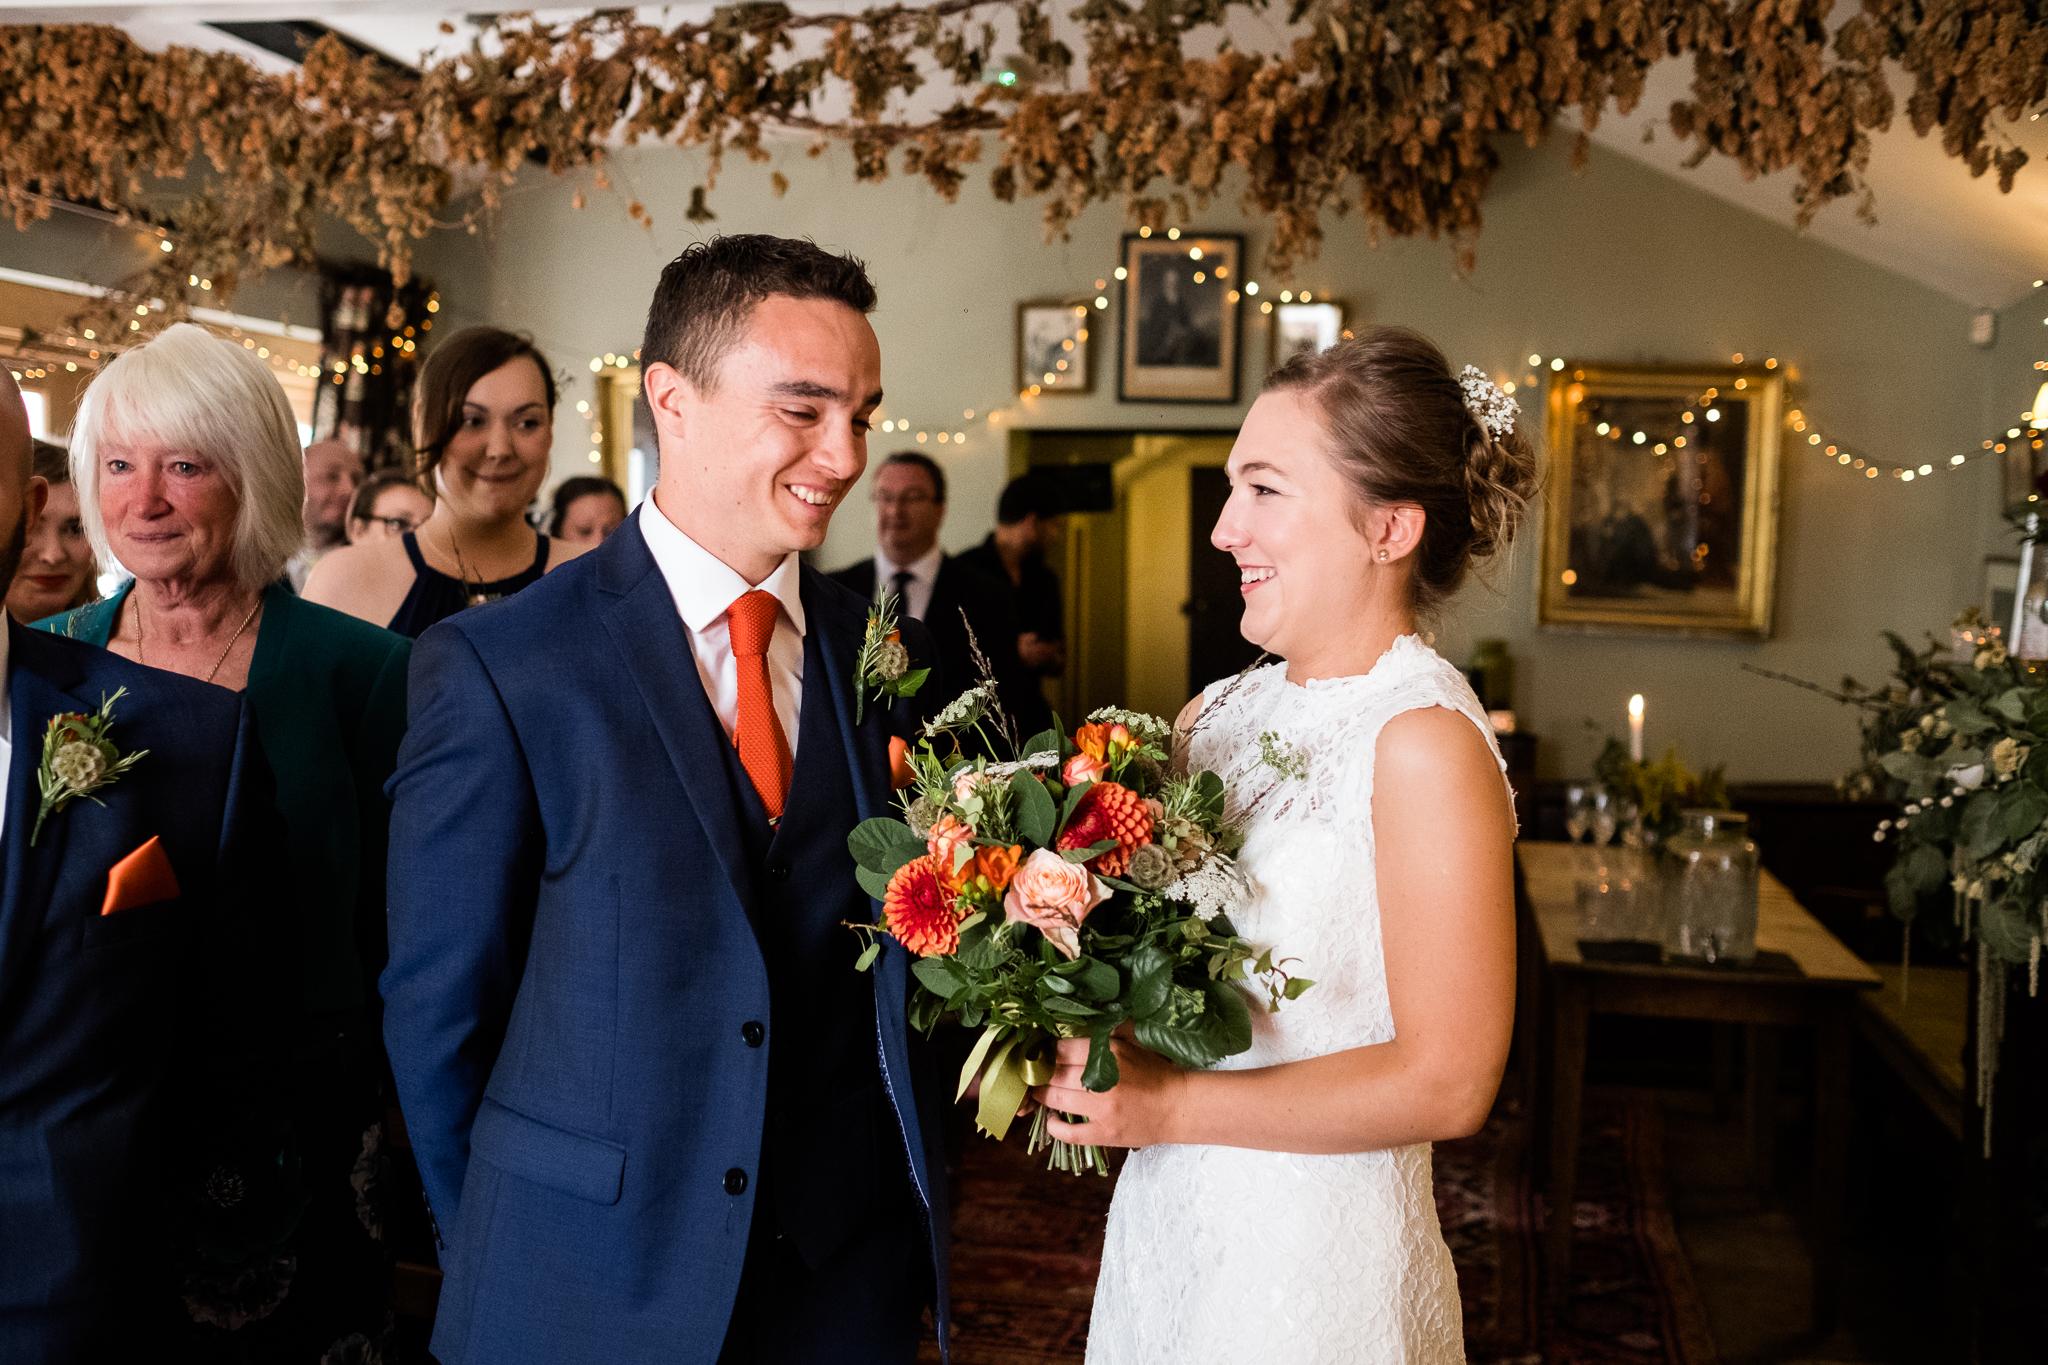 Relaxed Documentary Wedding Photography at The Wizard Inn, Alderley Edge Cheshire - Jenny Harper-21.jpg